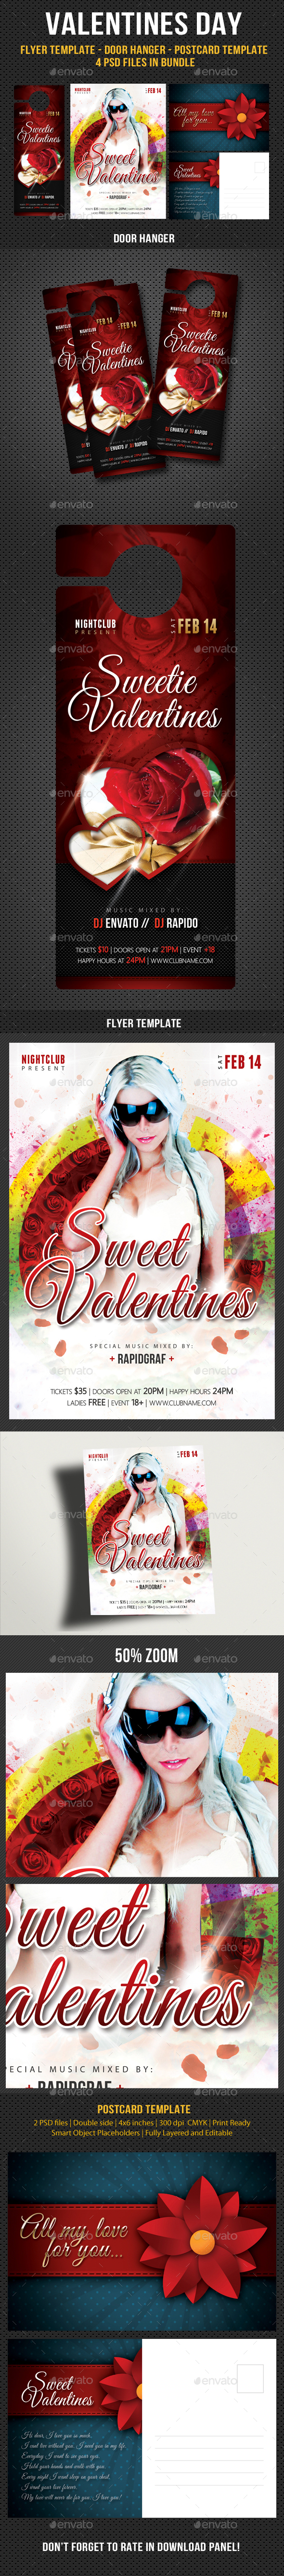 Valentines Day Flyer - Hunger - Postcard Bundle - Events Flyers